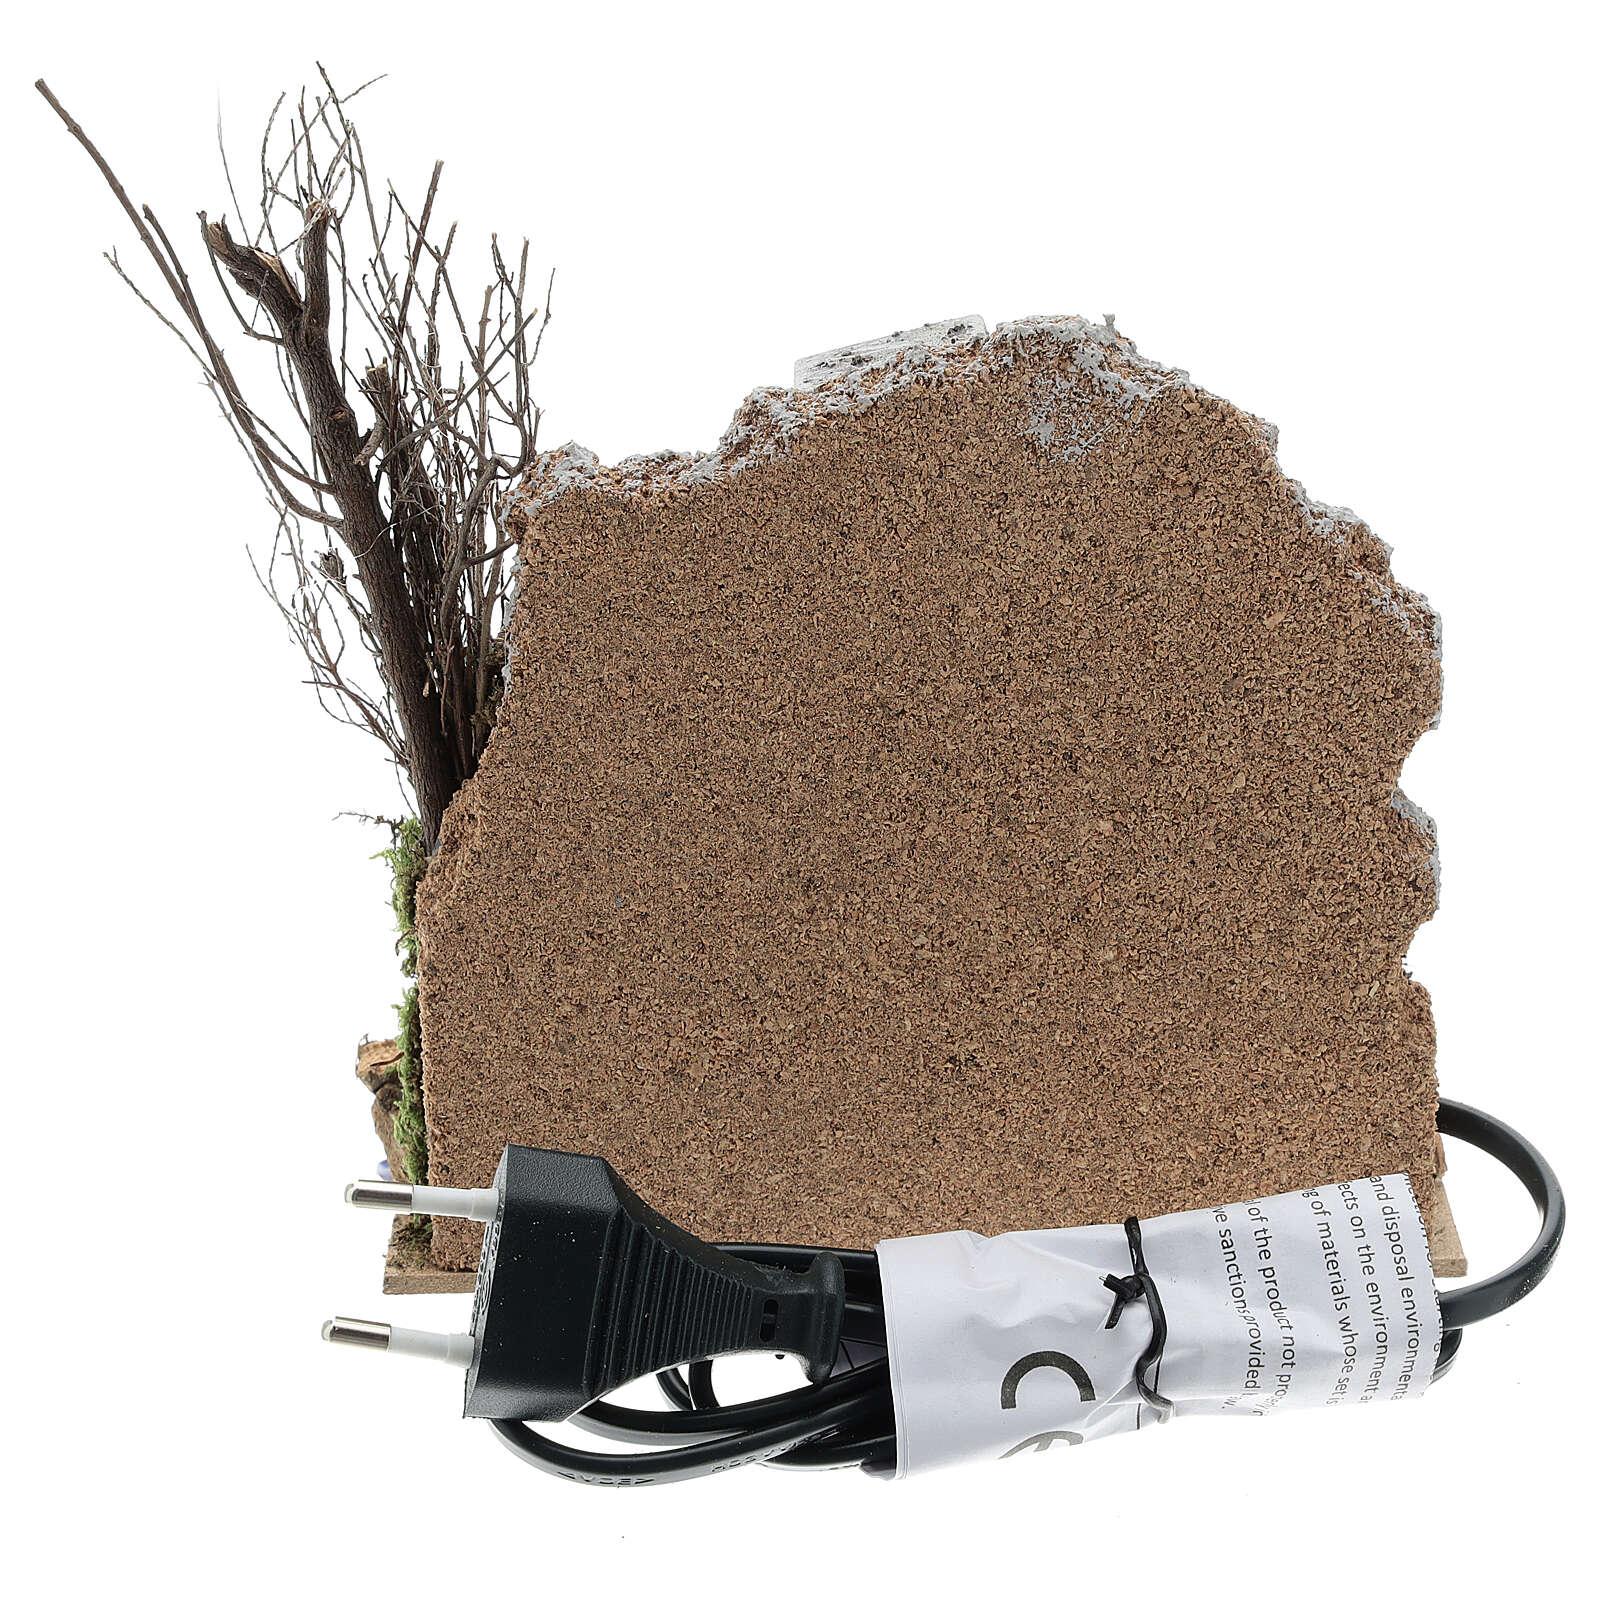 Open brick oven FLICKERING FLAME EFFECT bulb 15x15x10 cm nativity 10-12 cm 4